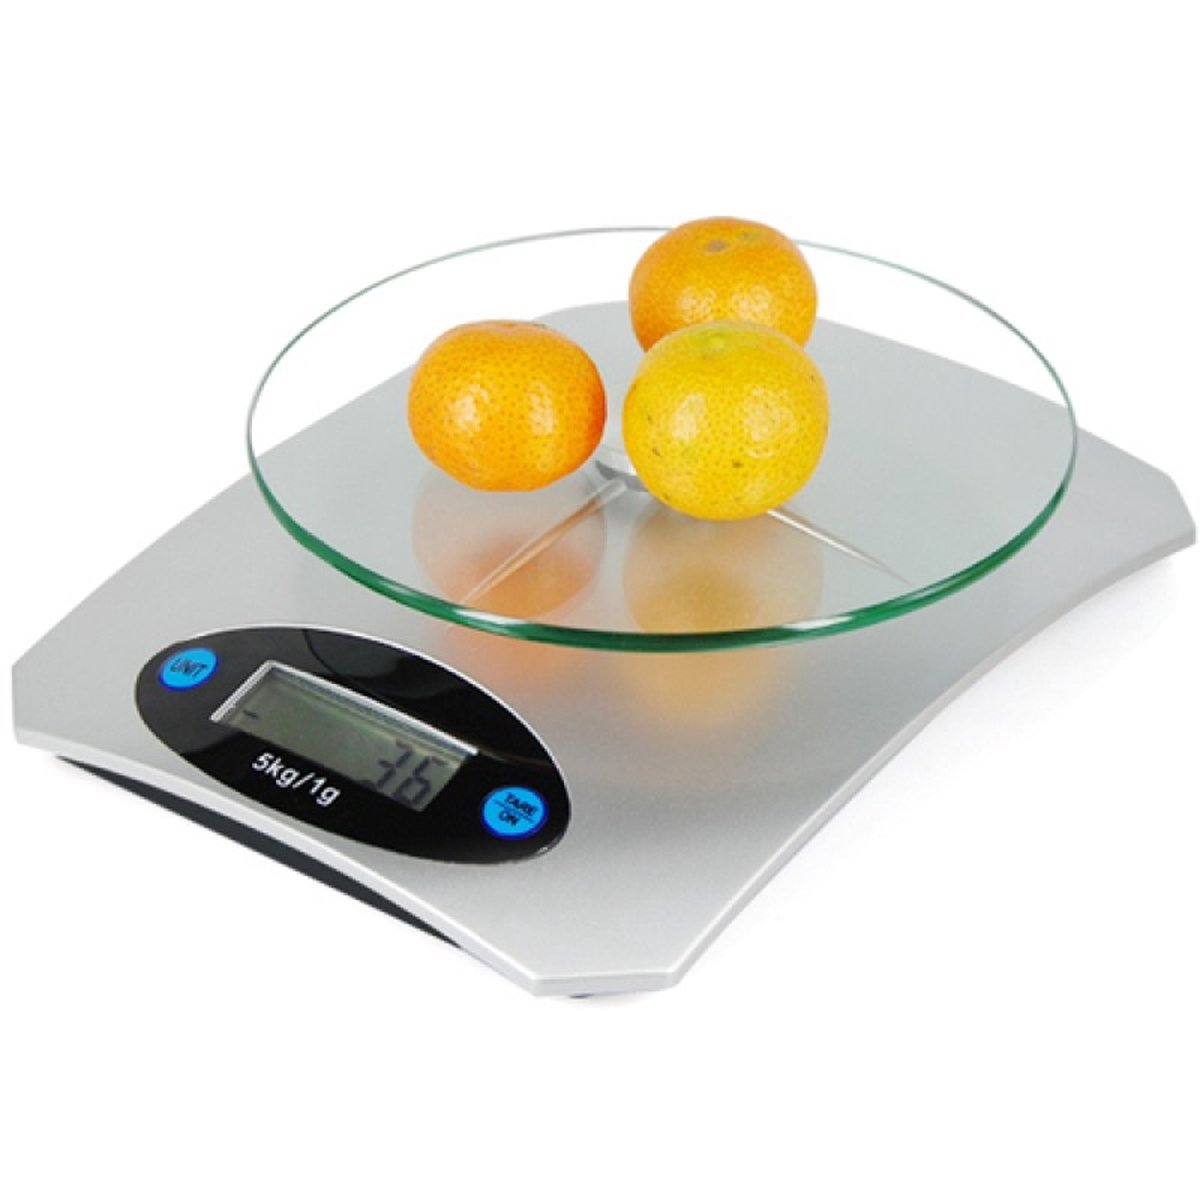 Elektronische keukenweegschaal 1G-5000G